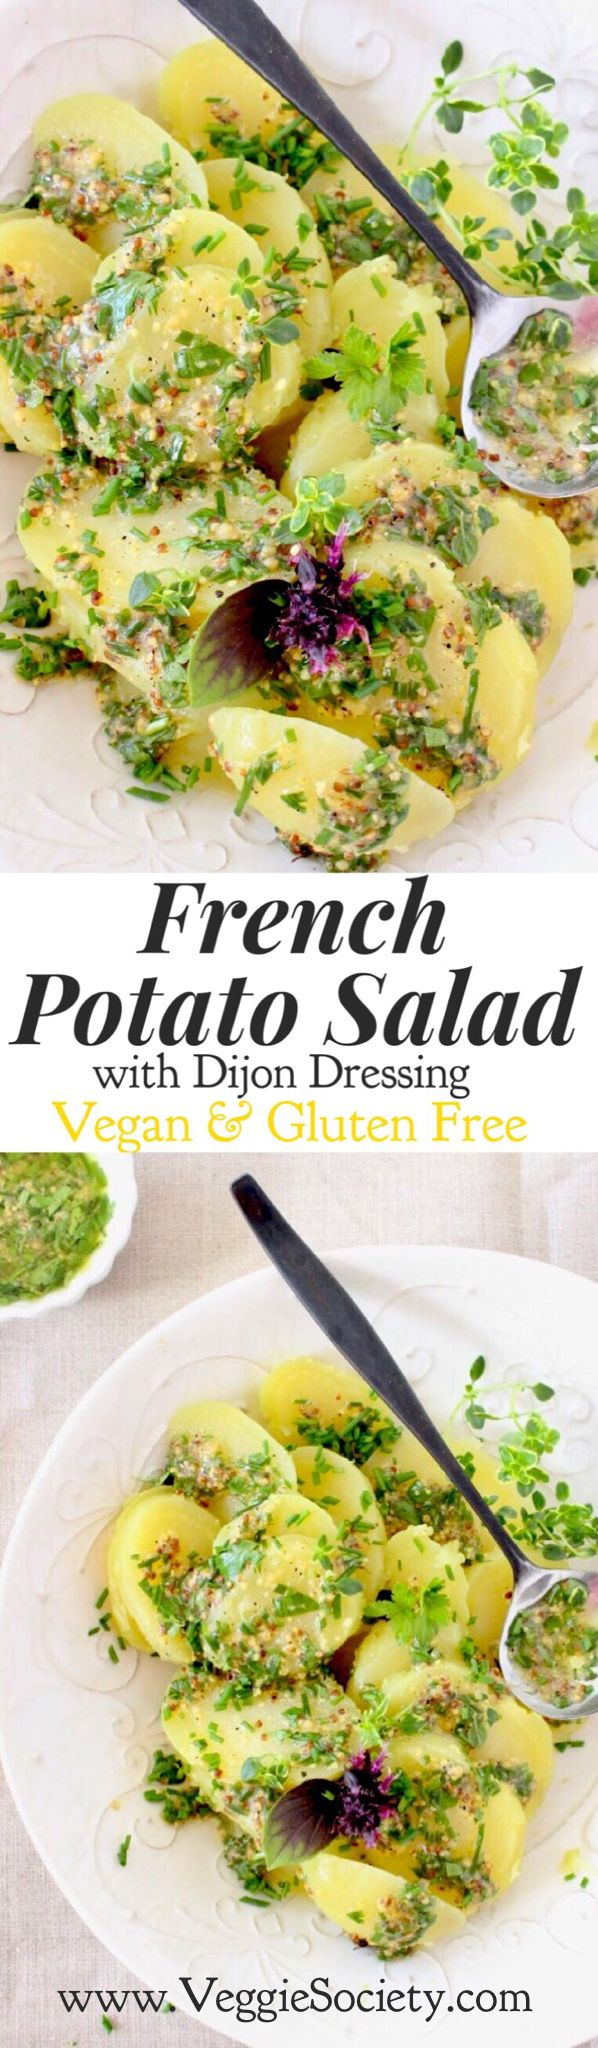 Vegan French Potato Salad Recipe with Dijon Mustard Dressing and Fresh Herbs | Healthy • Easy • Gluten-free | VeggieSociety.com @VeggieSociety